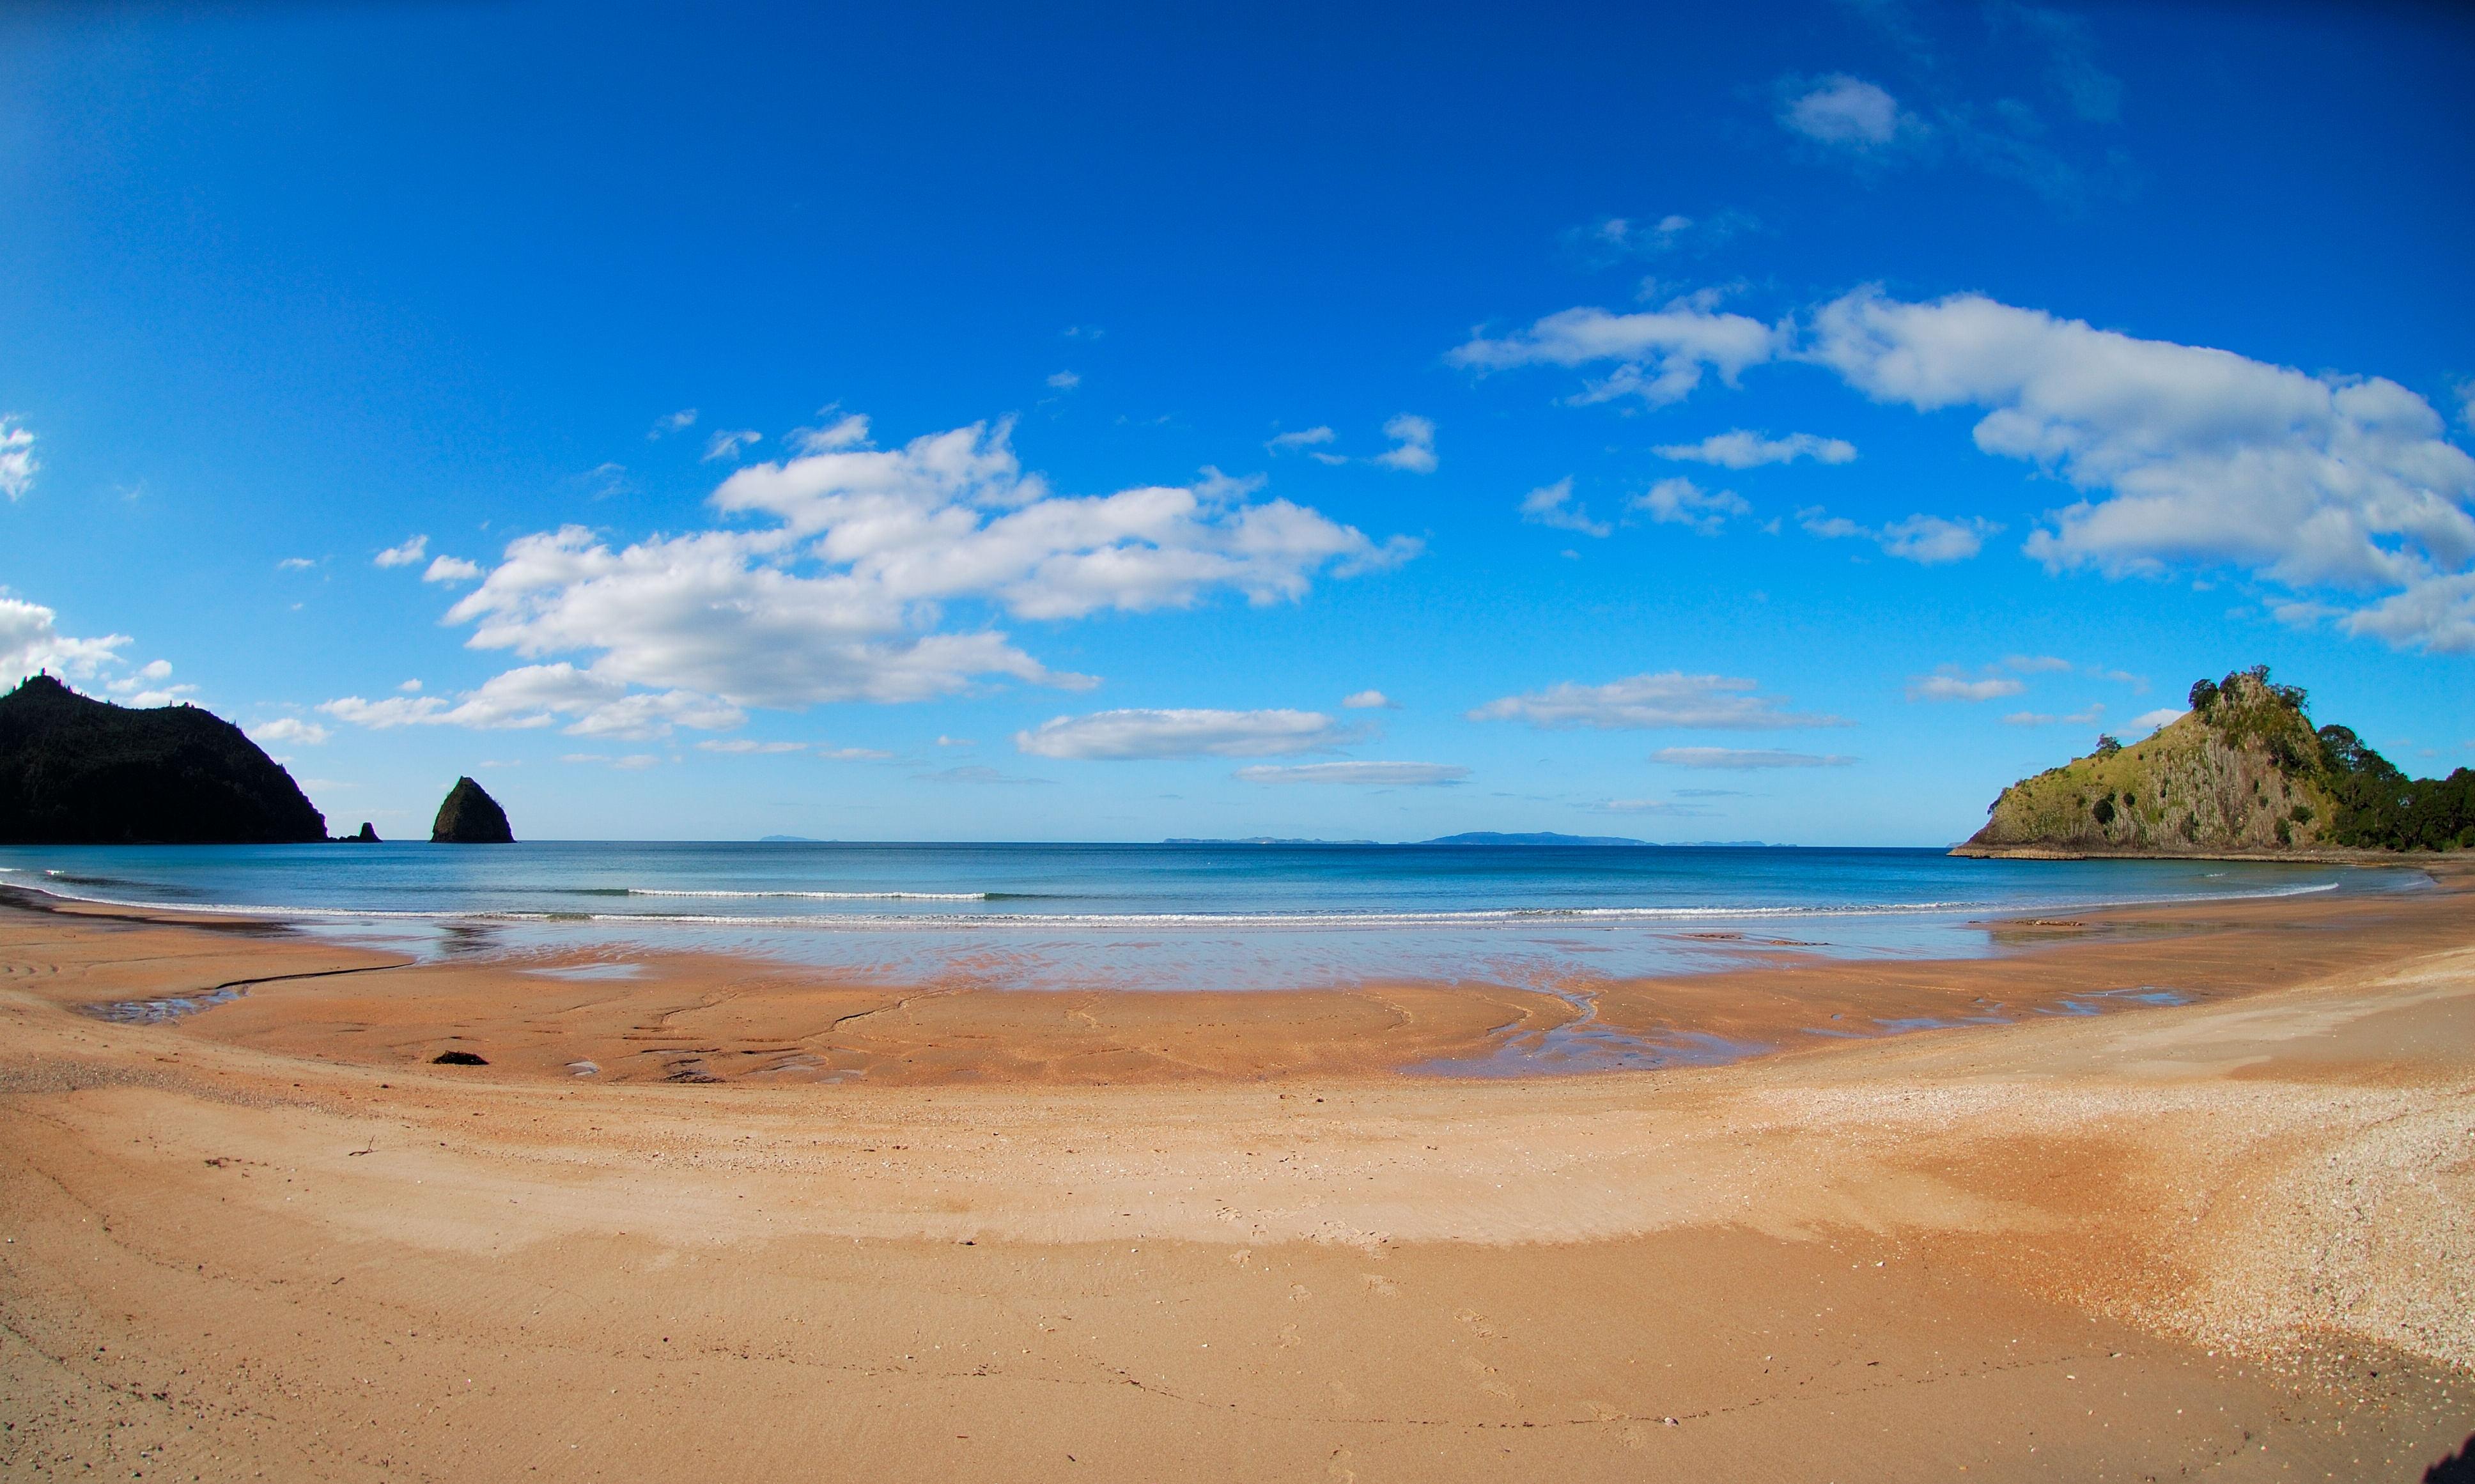 New_Chums_beach_Whangapoua_Waikato.jpg